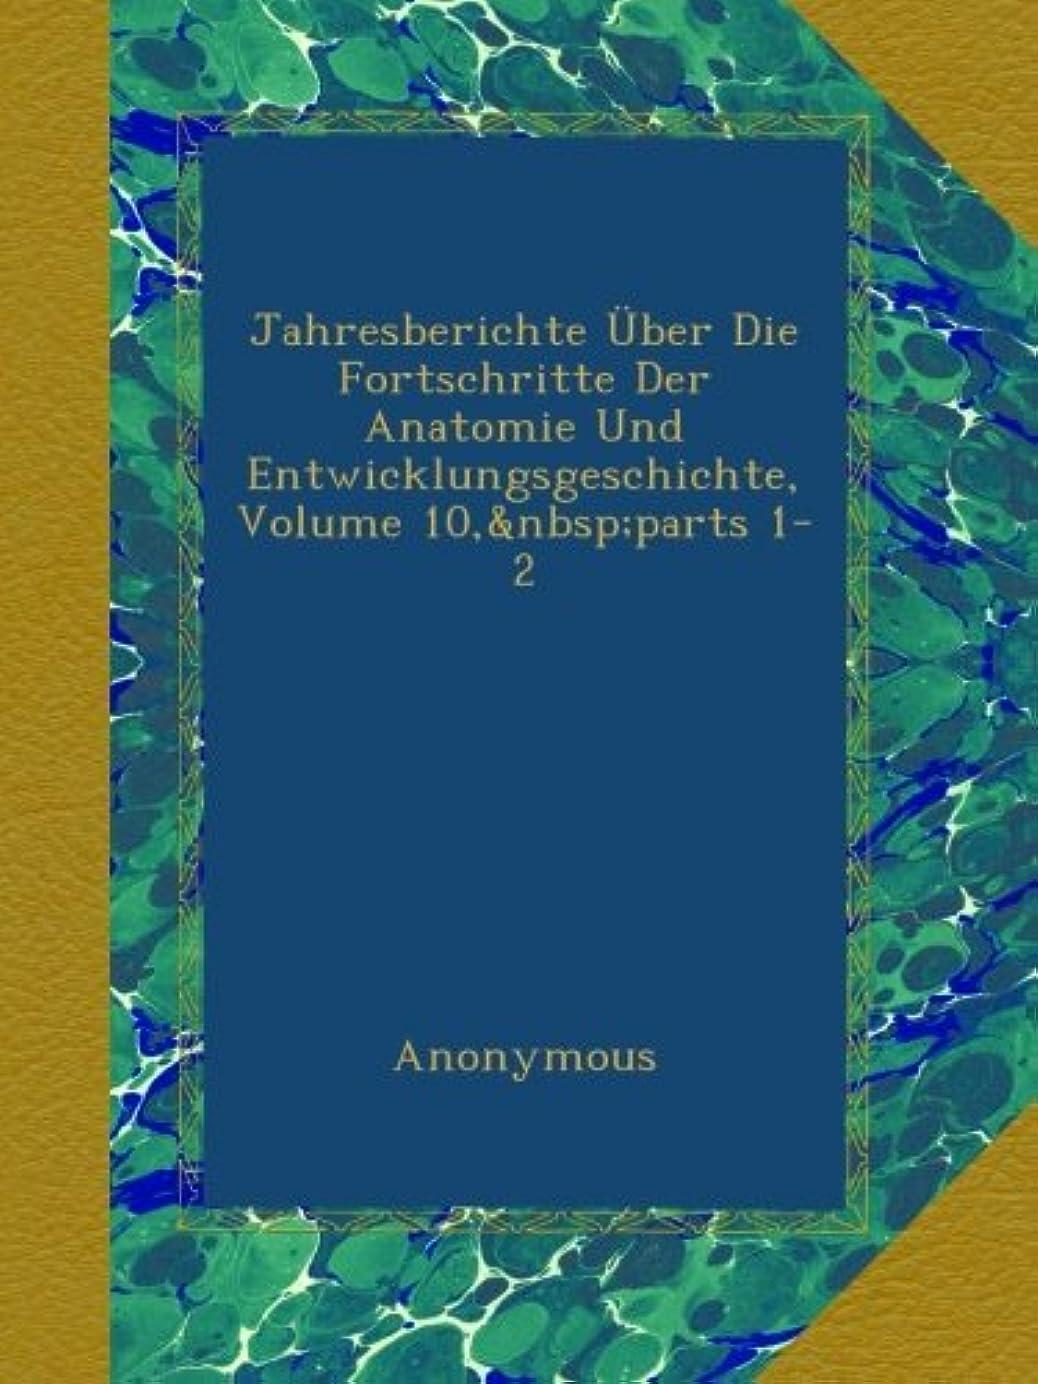 廃棄大学院ブルジョンJahresberichte Ueber Die Fortschritte Der Anatomie Und Entwicklungsgeschichte, Volume 10,?parts 1-2